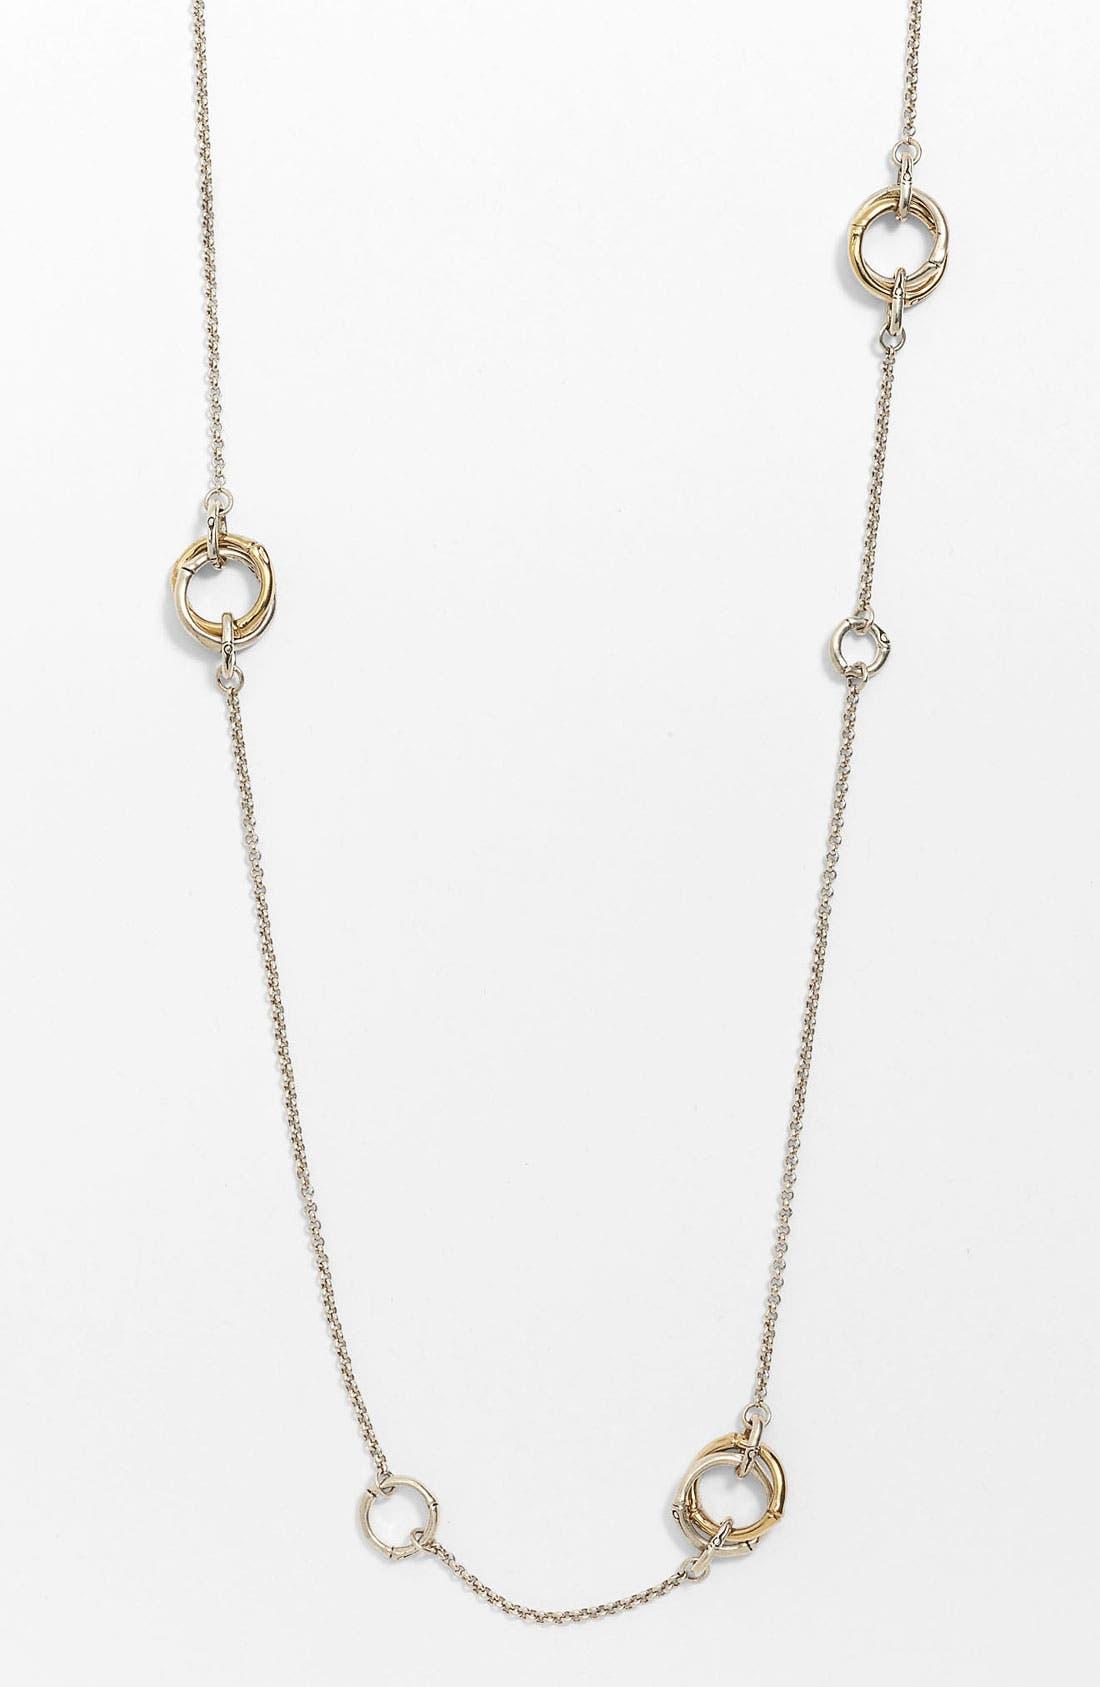 Alternate Image 1 Selected - John Hardy 'Bamboo' Long Station Necklace